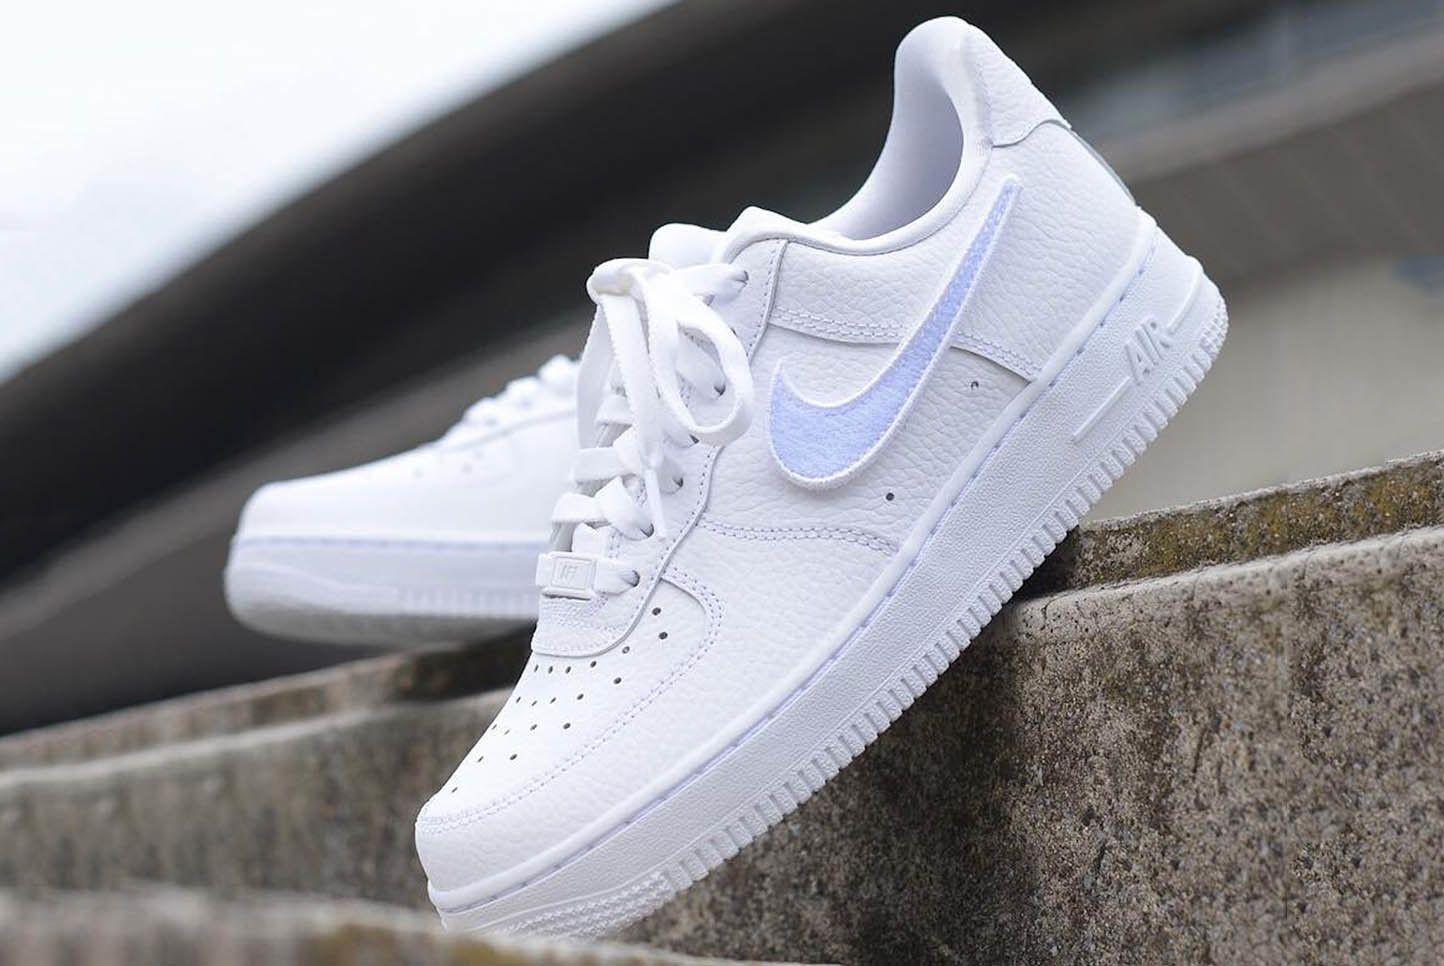 Nike Air Force 1 100 Aq3621 111 2 Sneaker Freaker